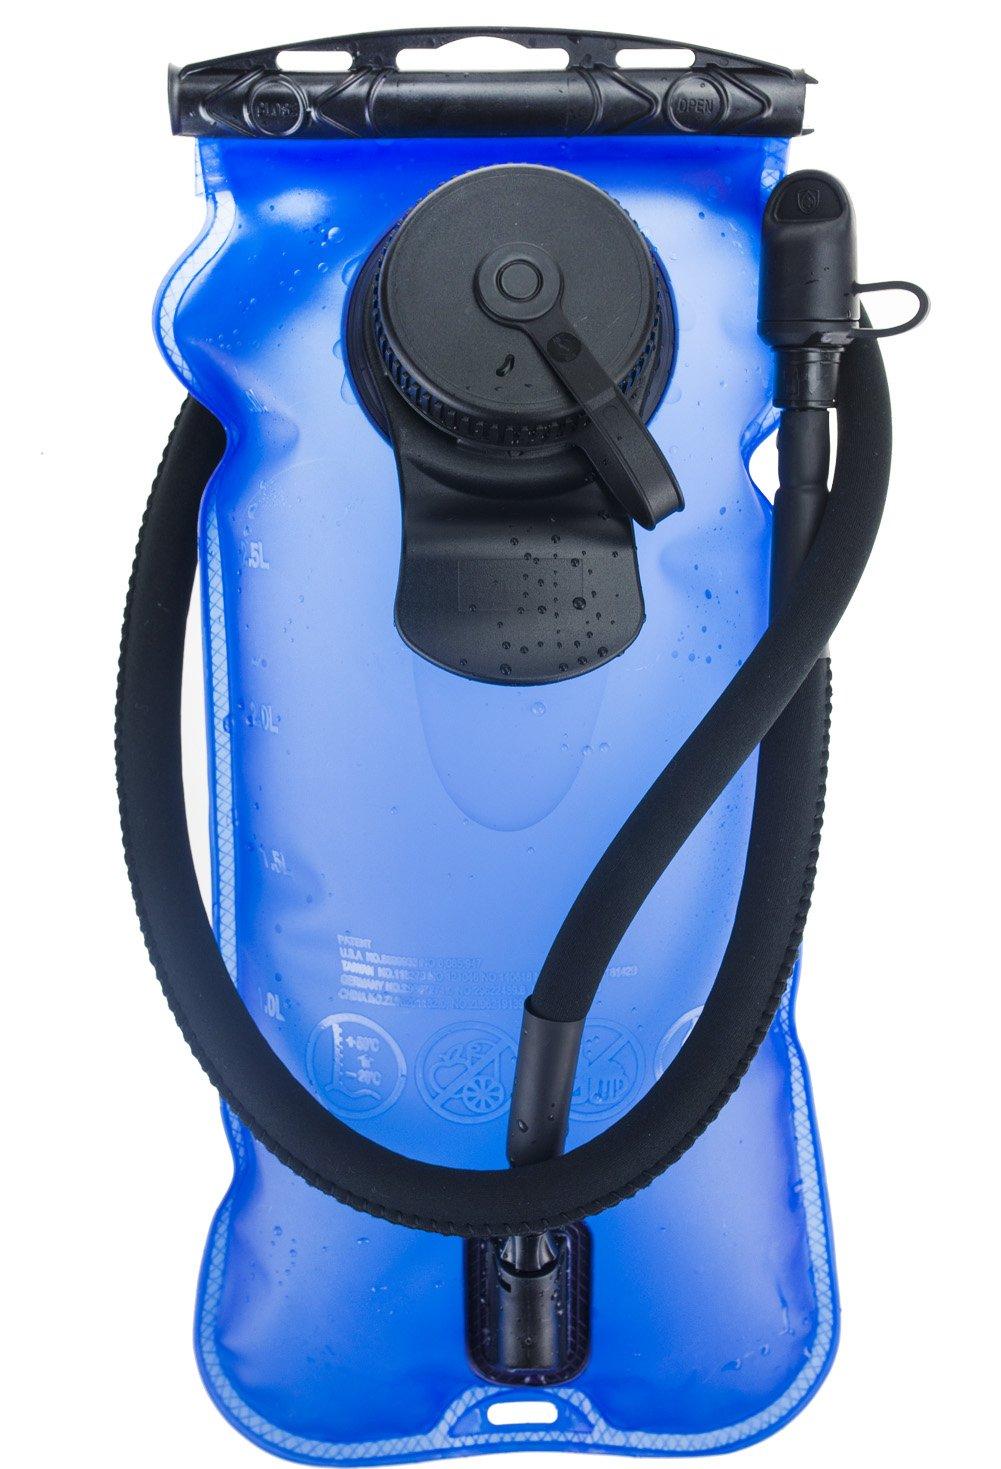 WACOOL 3L 3Liter 100oz BPA Free EVA Hydration Pack Bladder, Leak-Proof Water Reservoir (Blue(Double Opening)) by WACOOL